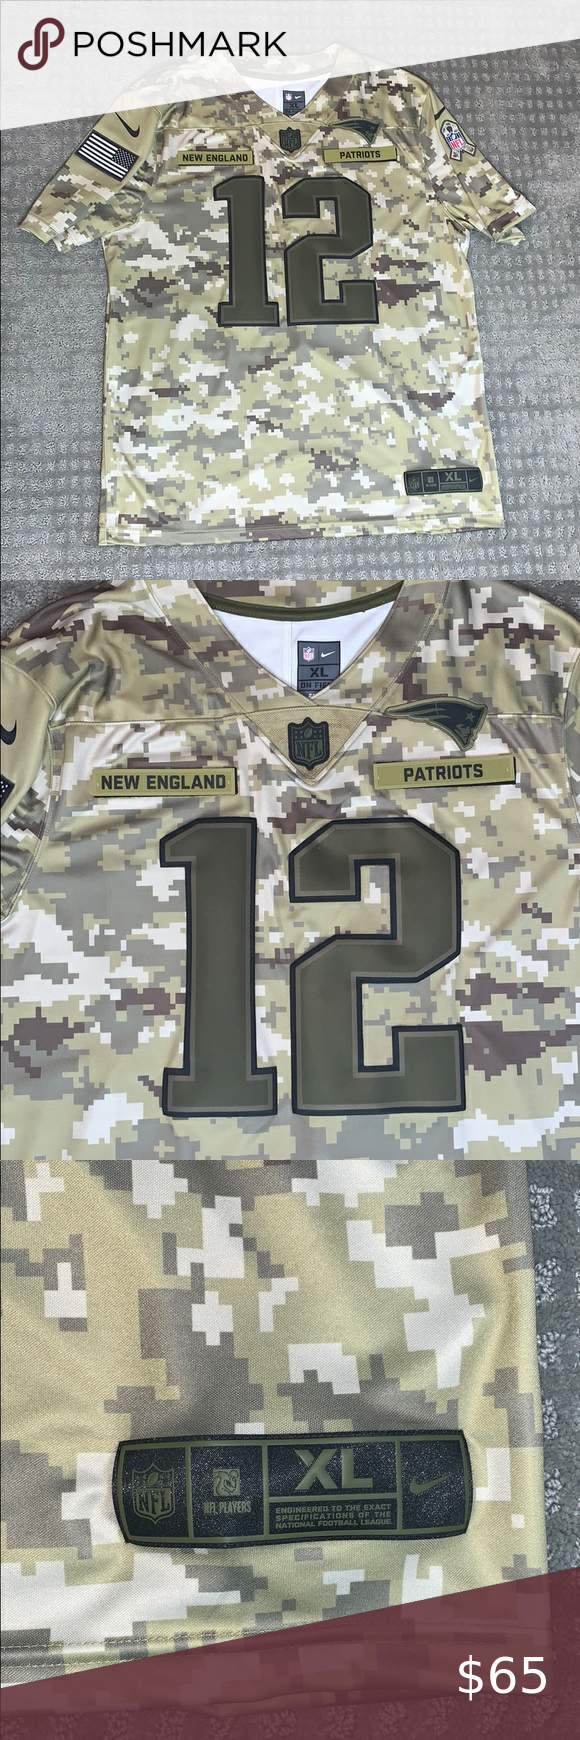 patriots military jersey